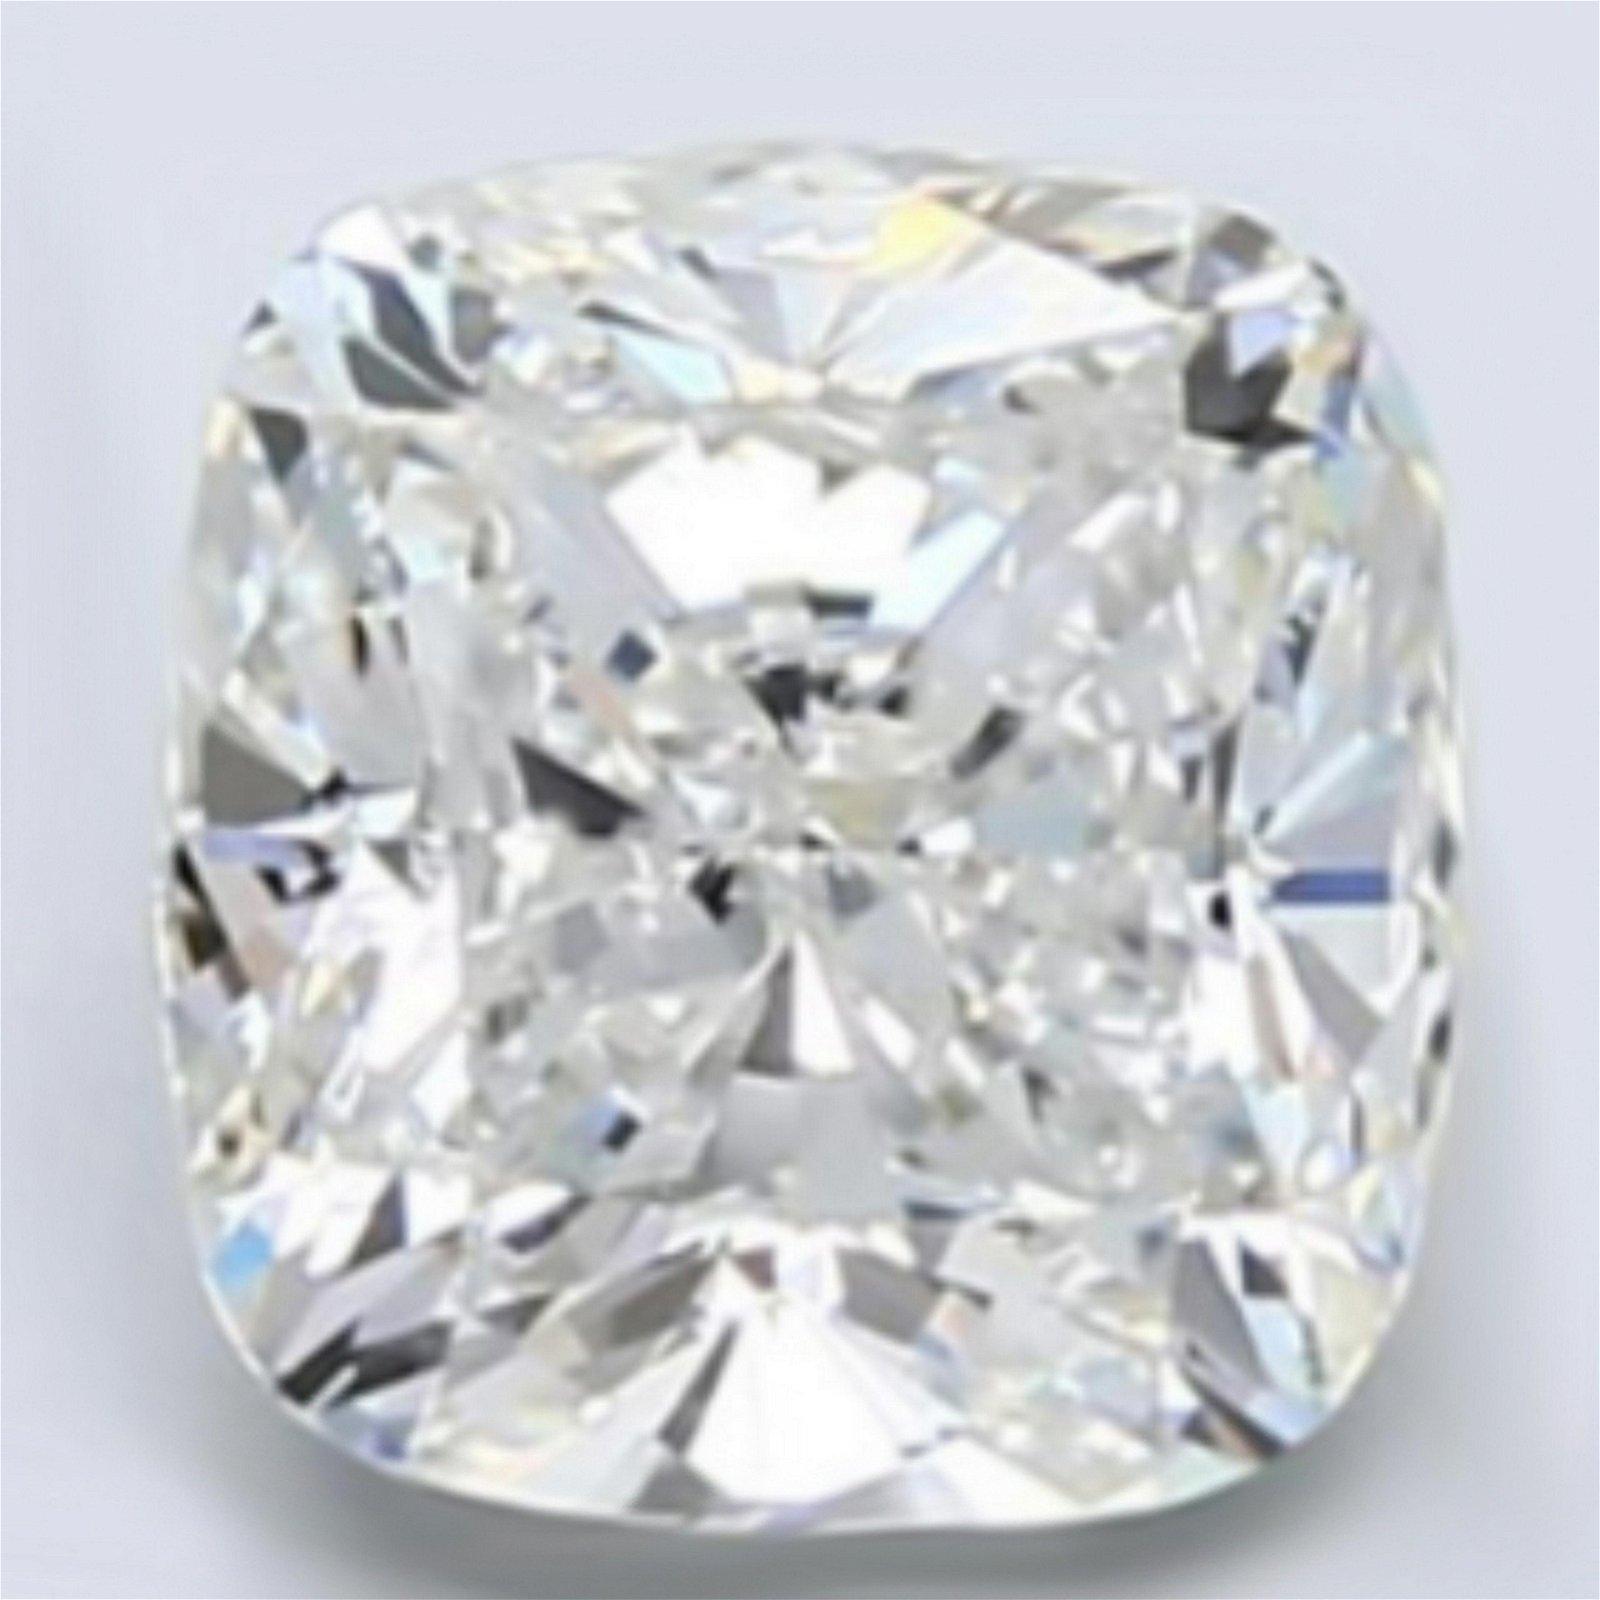 4.09 ct Loose Cushion Cut Diamond Color D VS2 47% OFF